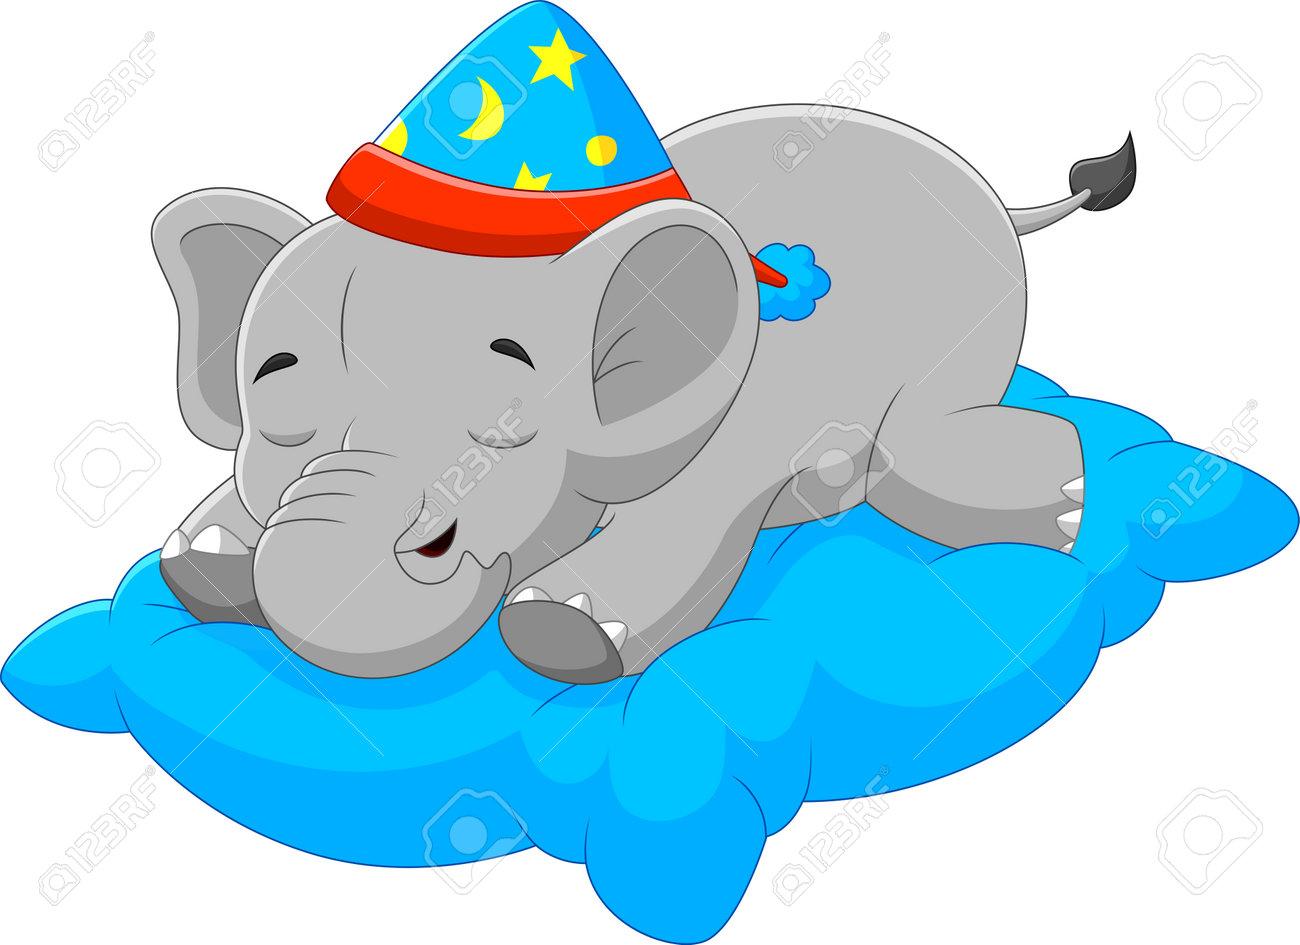 cartoon baby elephant sleeping on pillow - 169087668